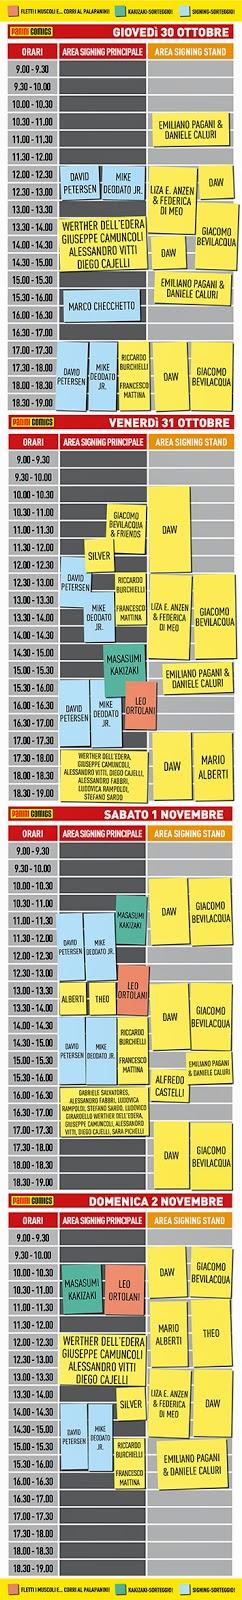 AUTOGRAFI STAND PANINI COMICS LUCCA 2014.jpg